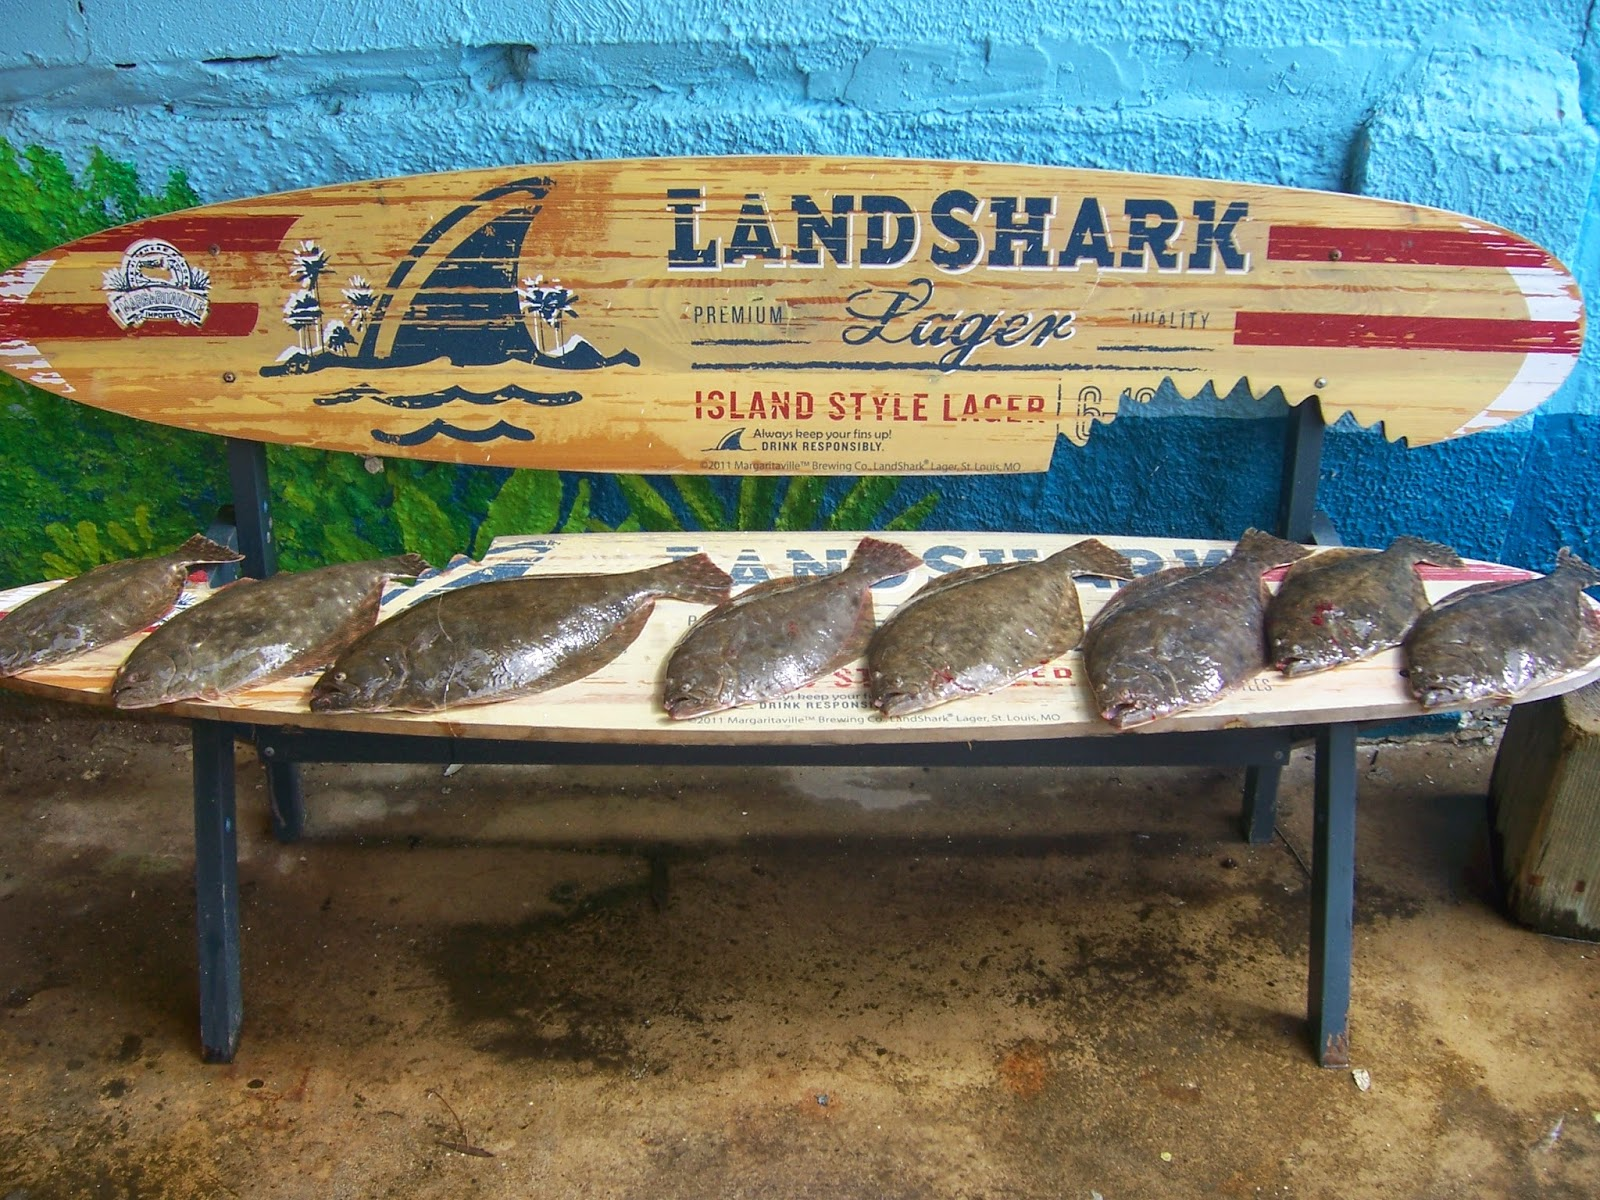 Galveston fishing report galveston fishing charter company for Galveston fishing report seawolf park